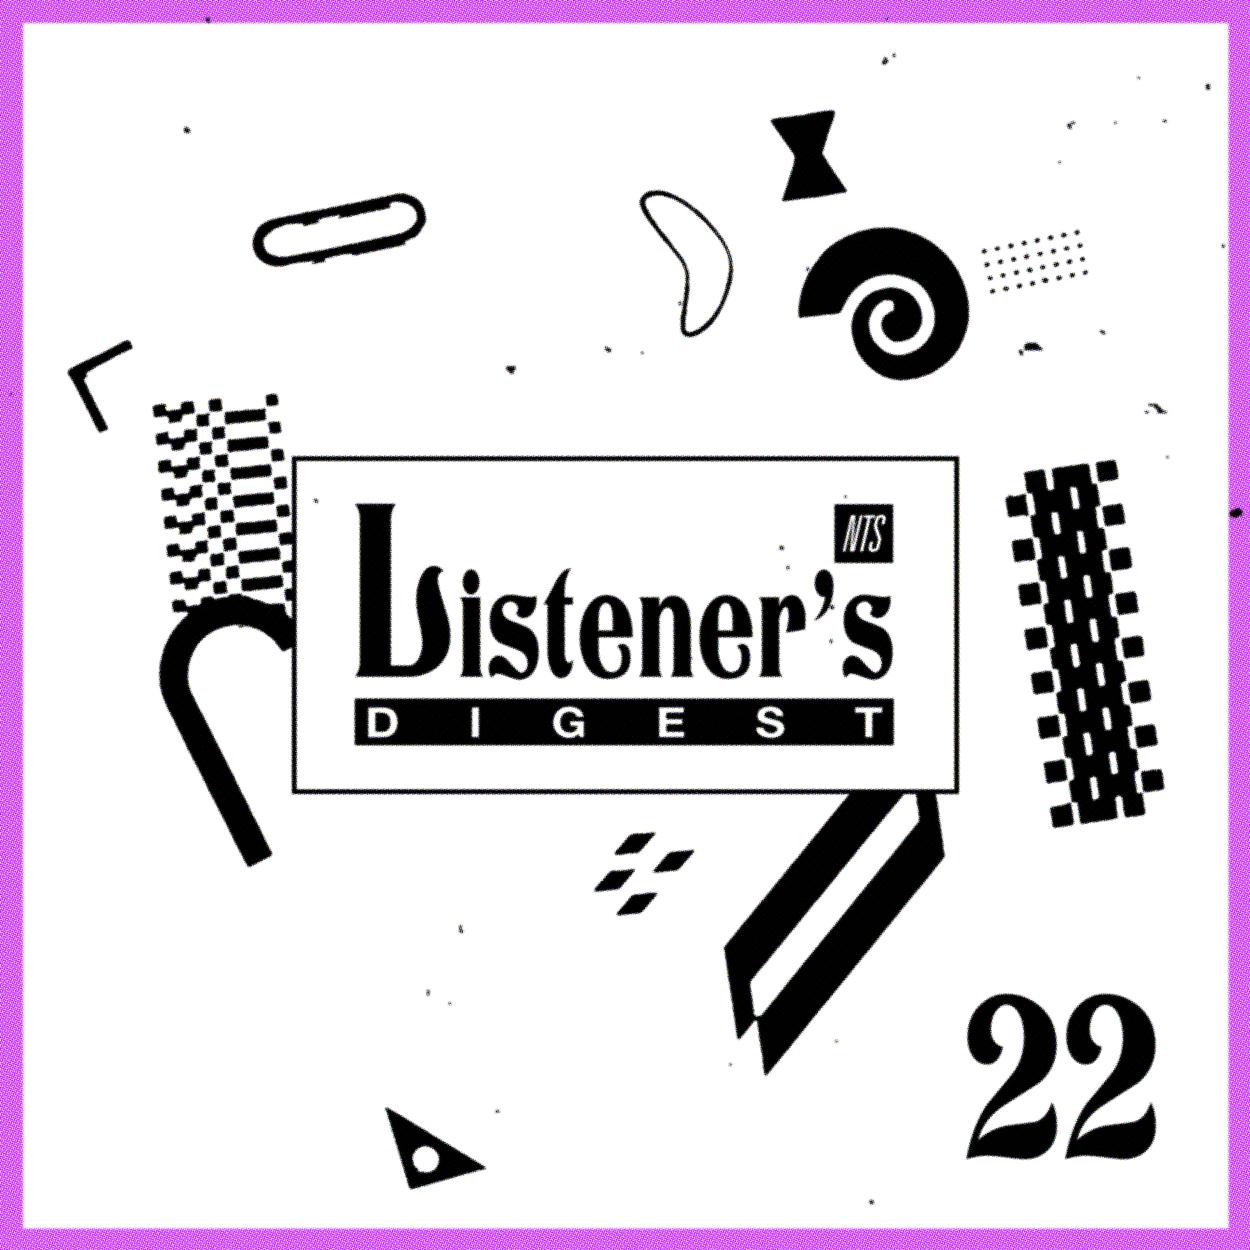 LIsteners Digest 22 - NTS.png